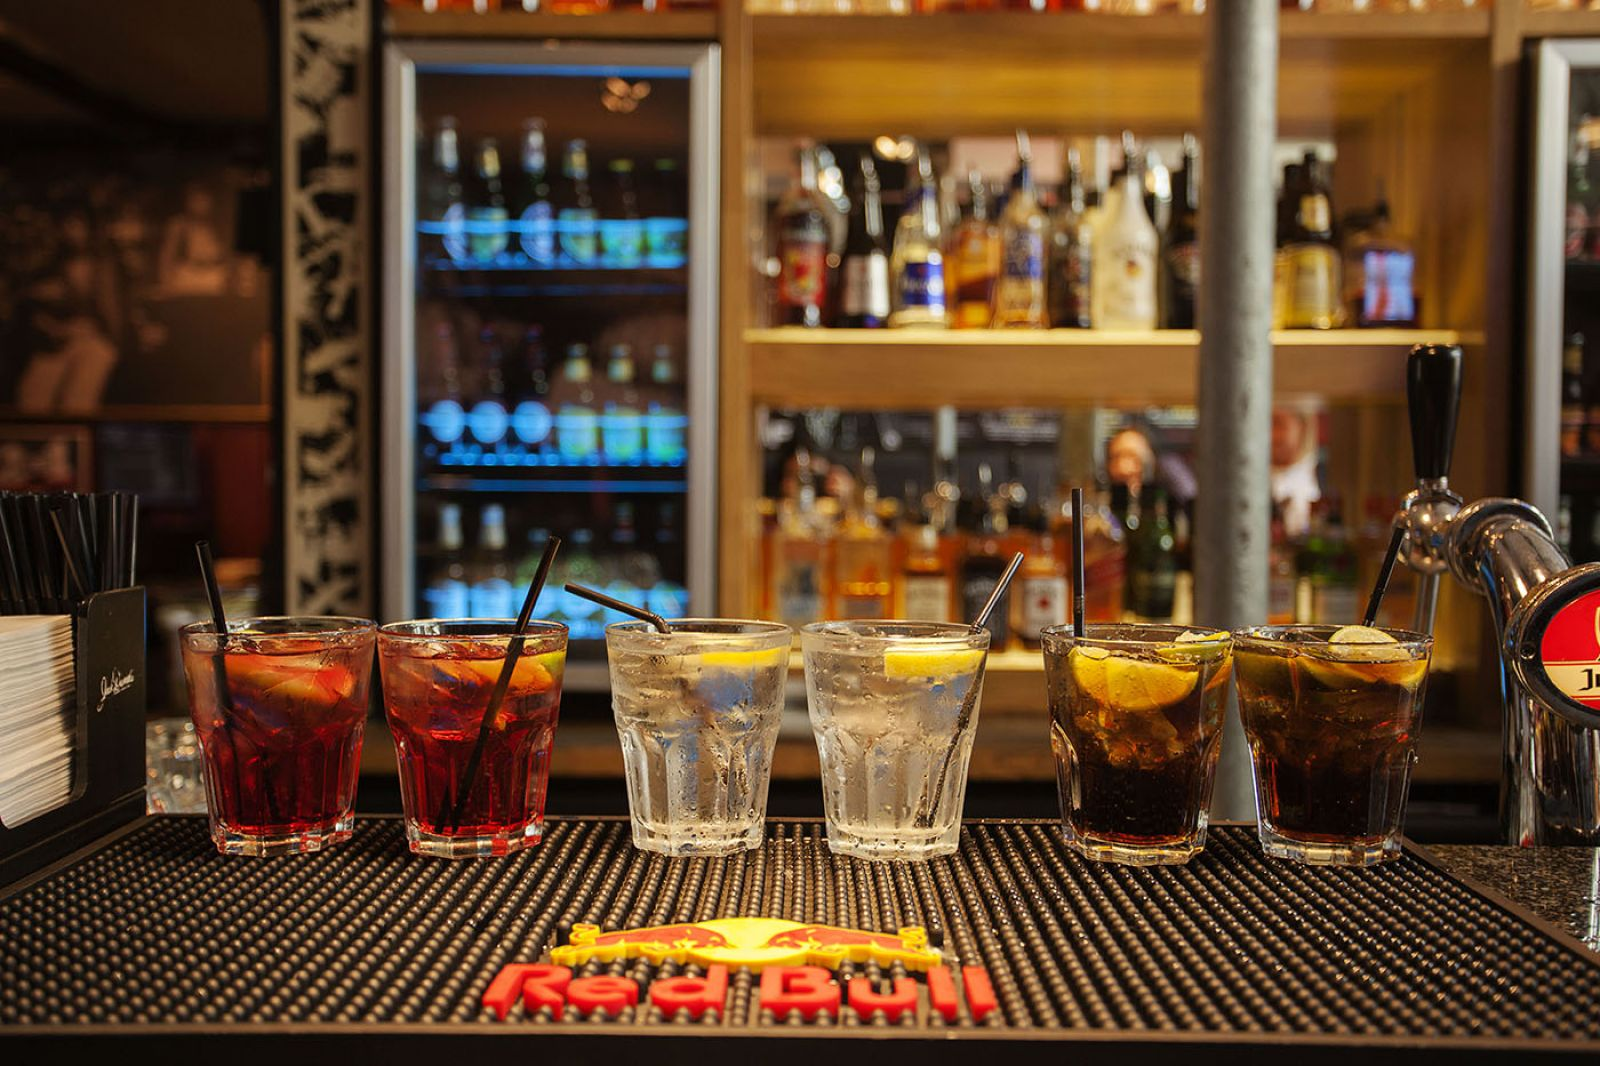 Bar in Amsterdam  Belushis Bars